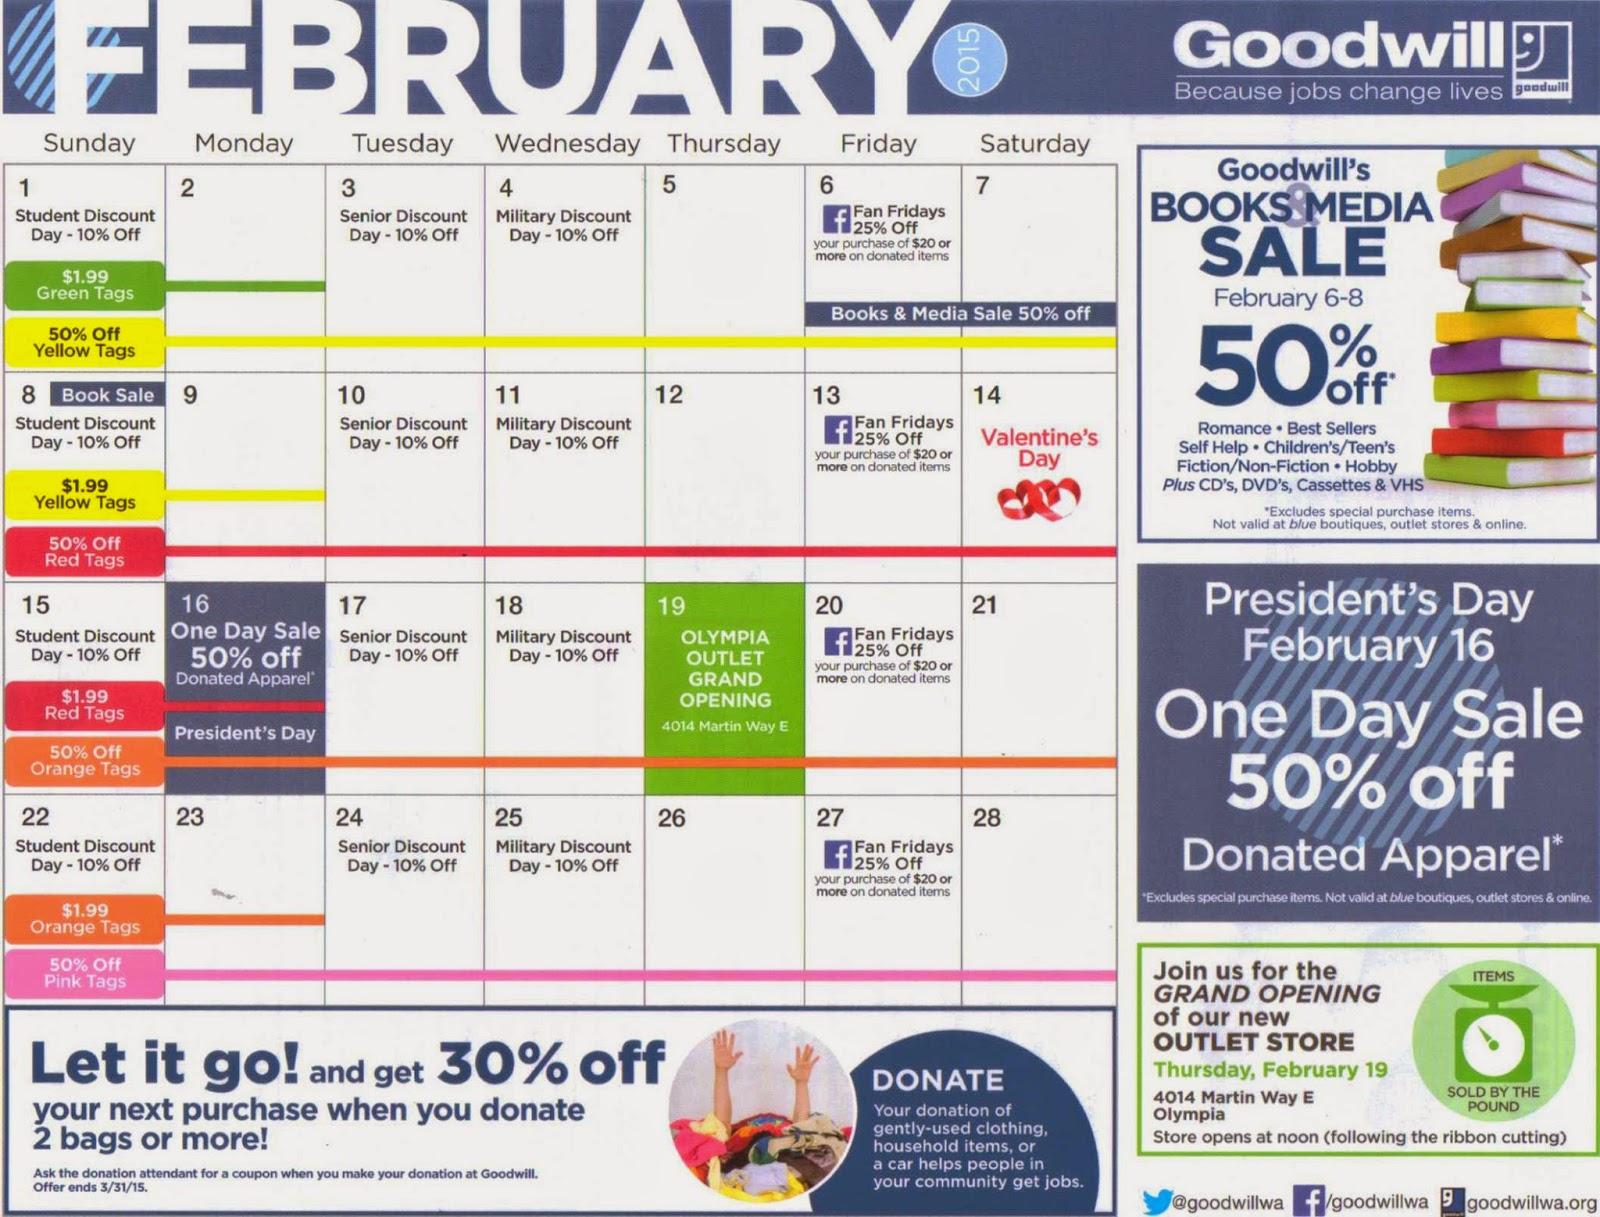 Rainier Lions Club Yelm Goodwill February Calendar Special News